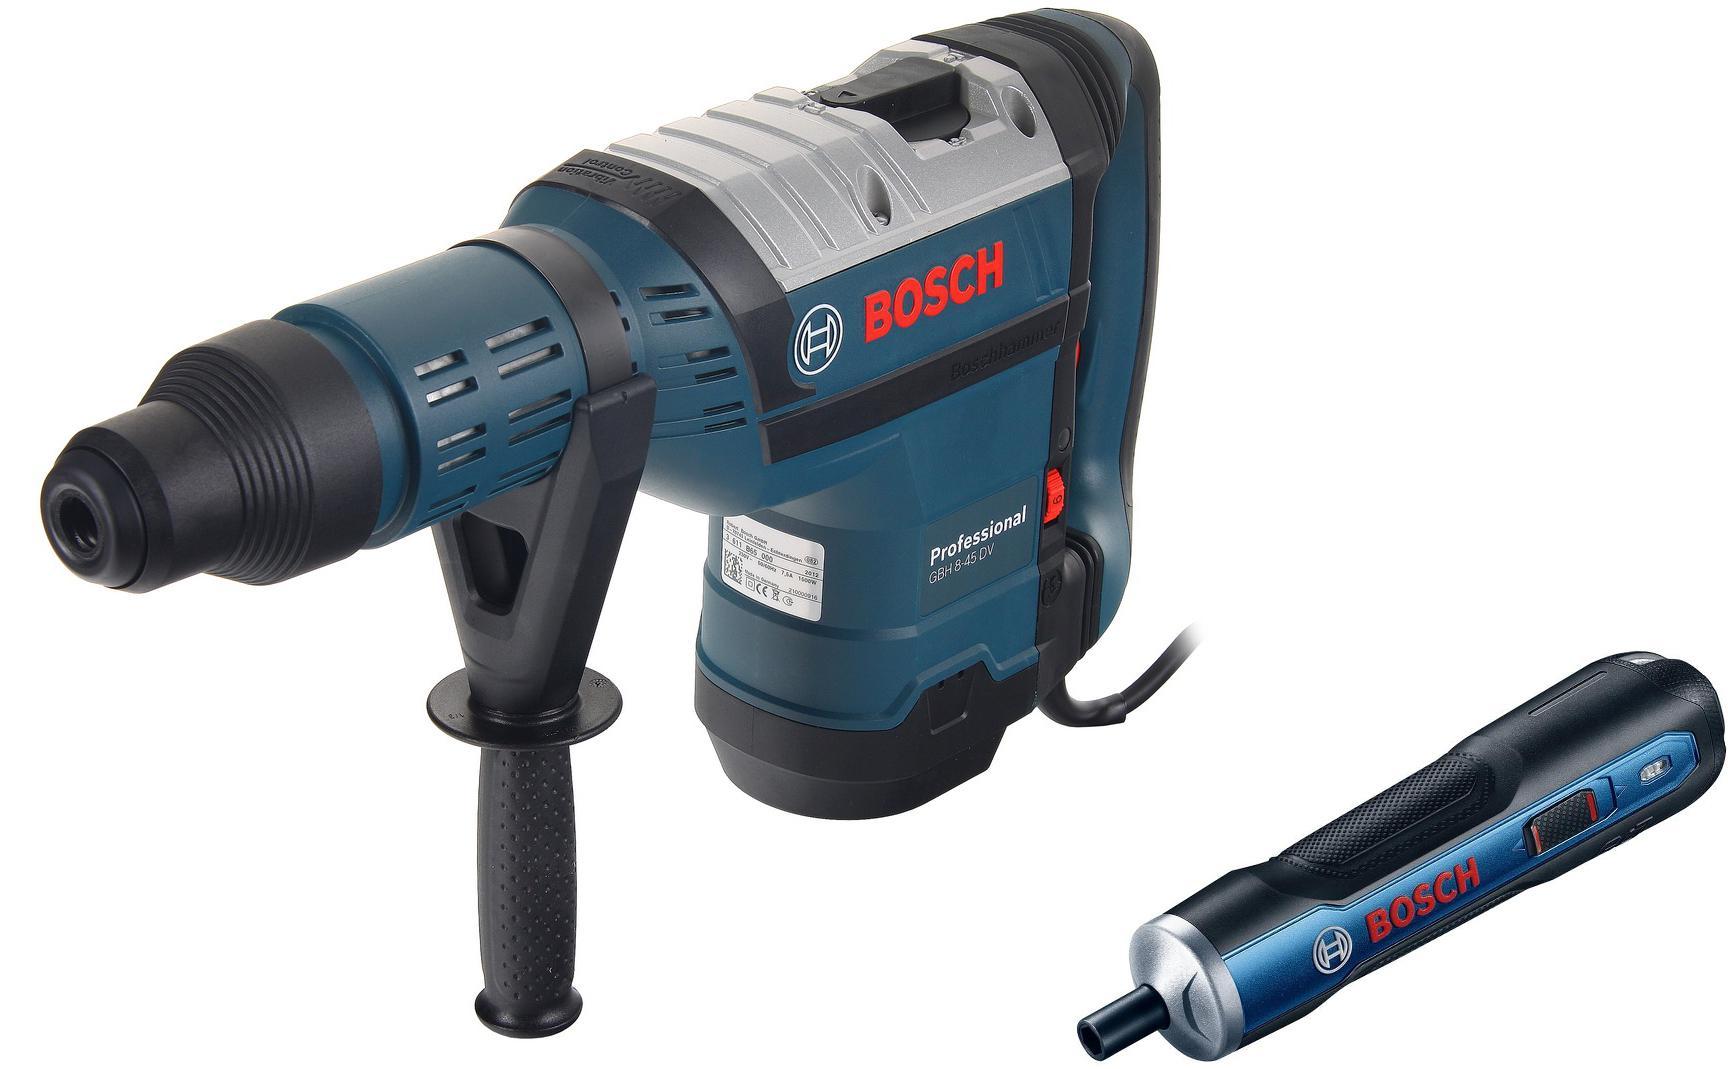 Набор Bosch Перфоратор gbh 8-45 dv (0.611.265.000) +Отвертка аккумуляторная go solo (0.601.9h2.020)